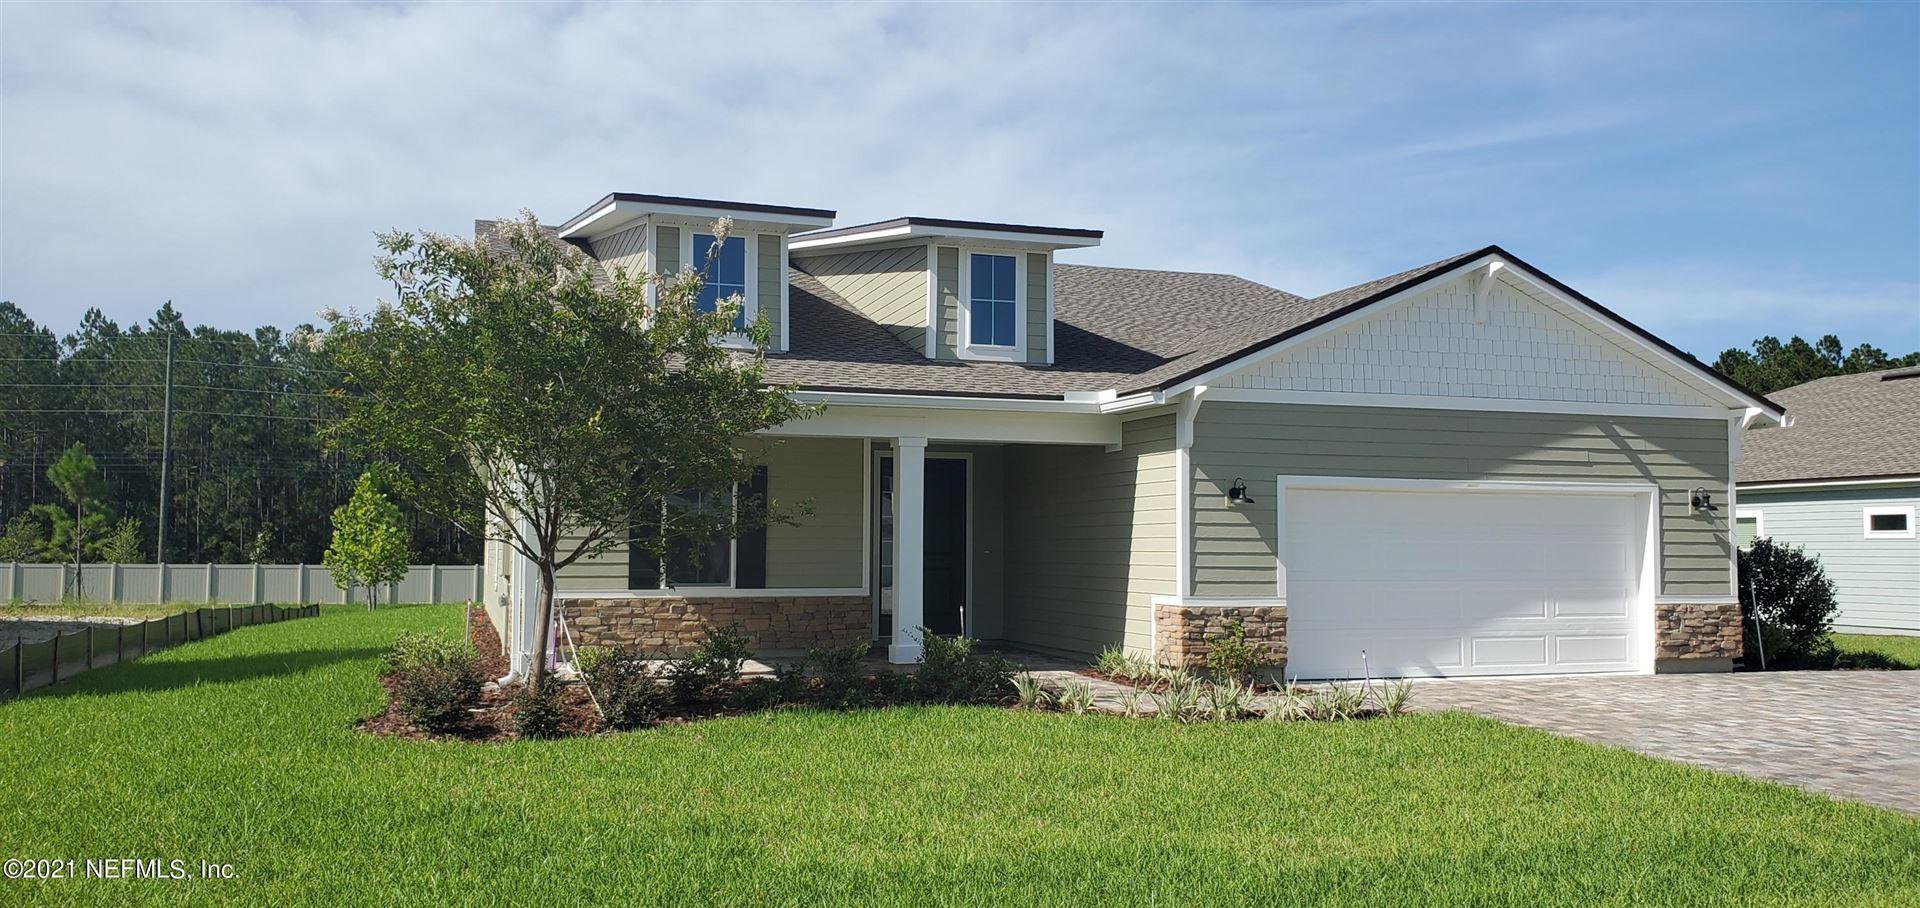 249 MORNING MIST LN #Lot No: 0014, Fruit Cove, FL 32259 - MLS#: 1120460